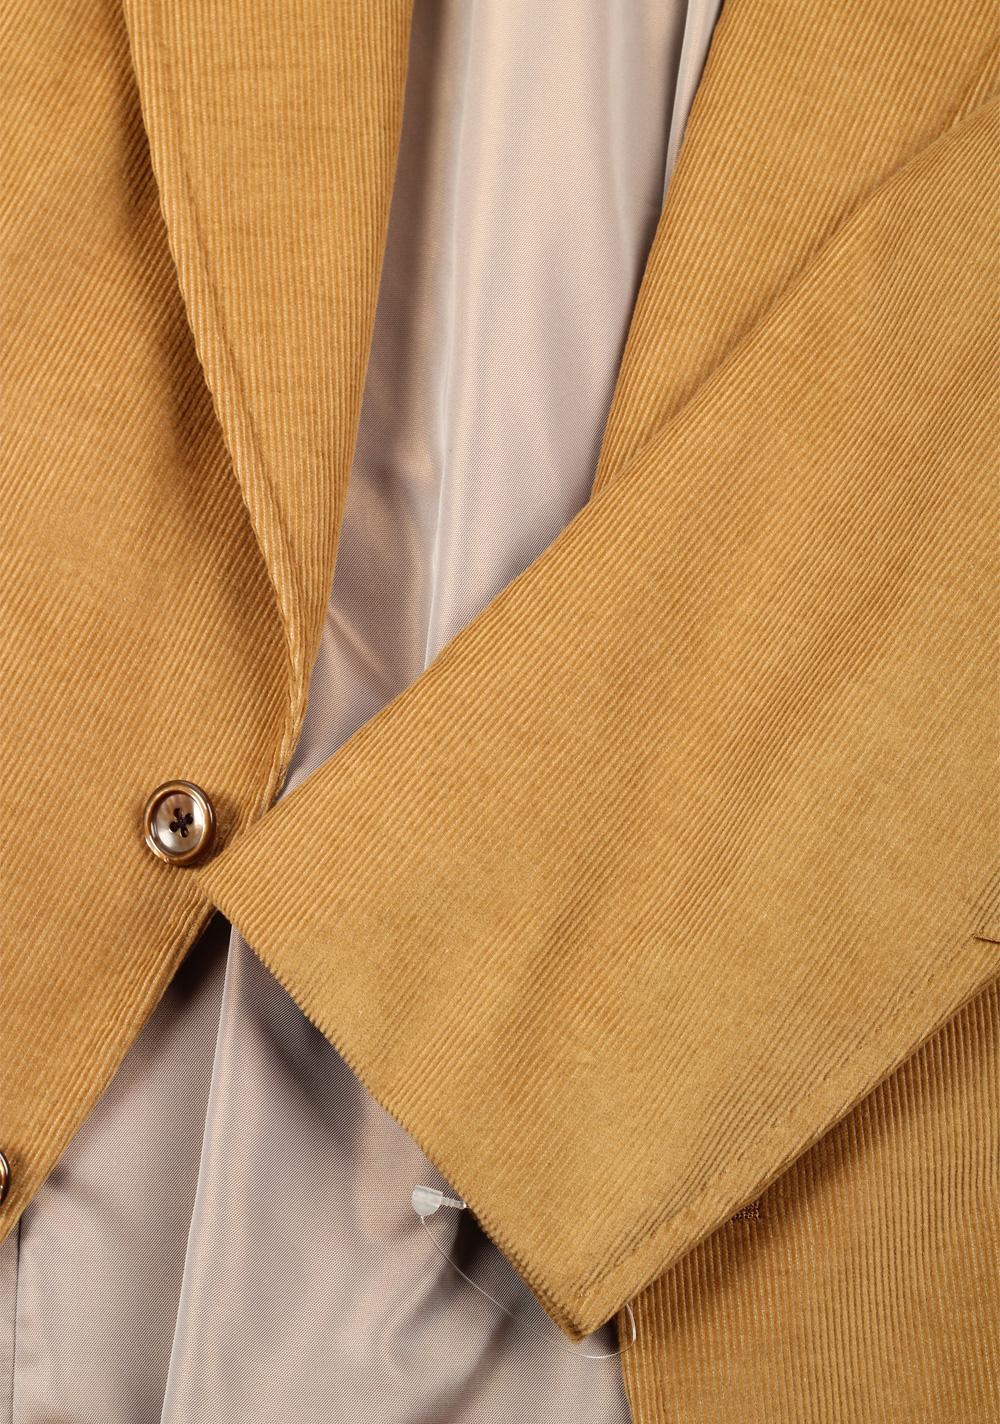 TOM FORD Shelton Beige Sport Coat Size 52 / 42R | Costume Limité